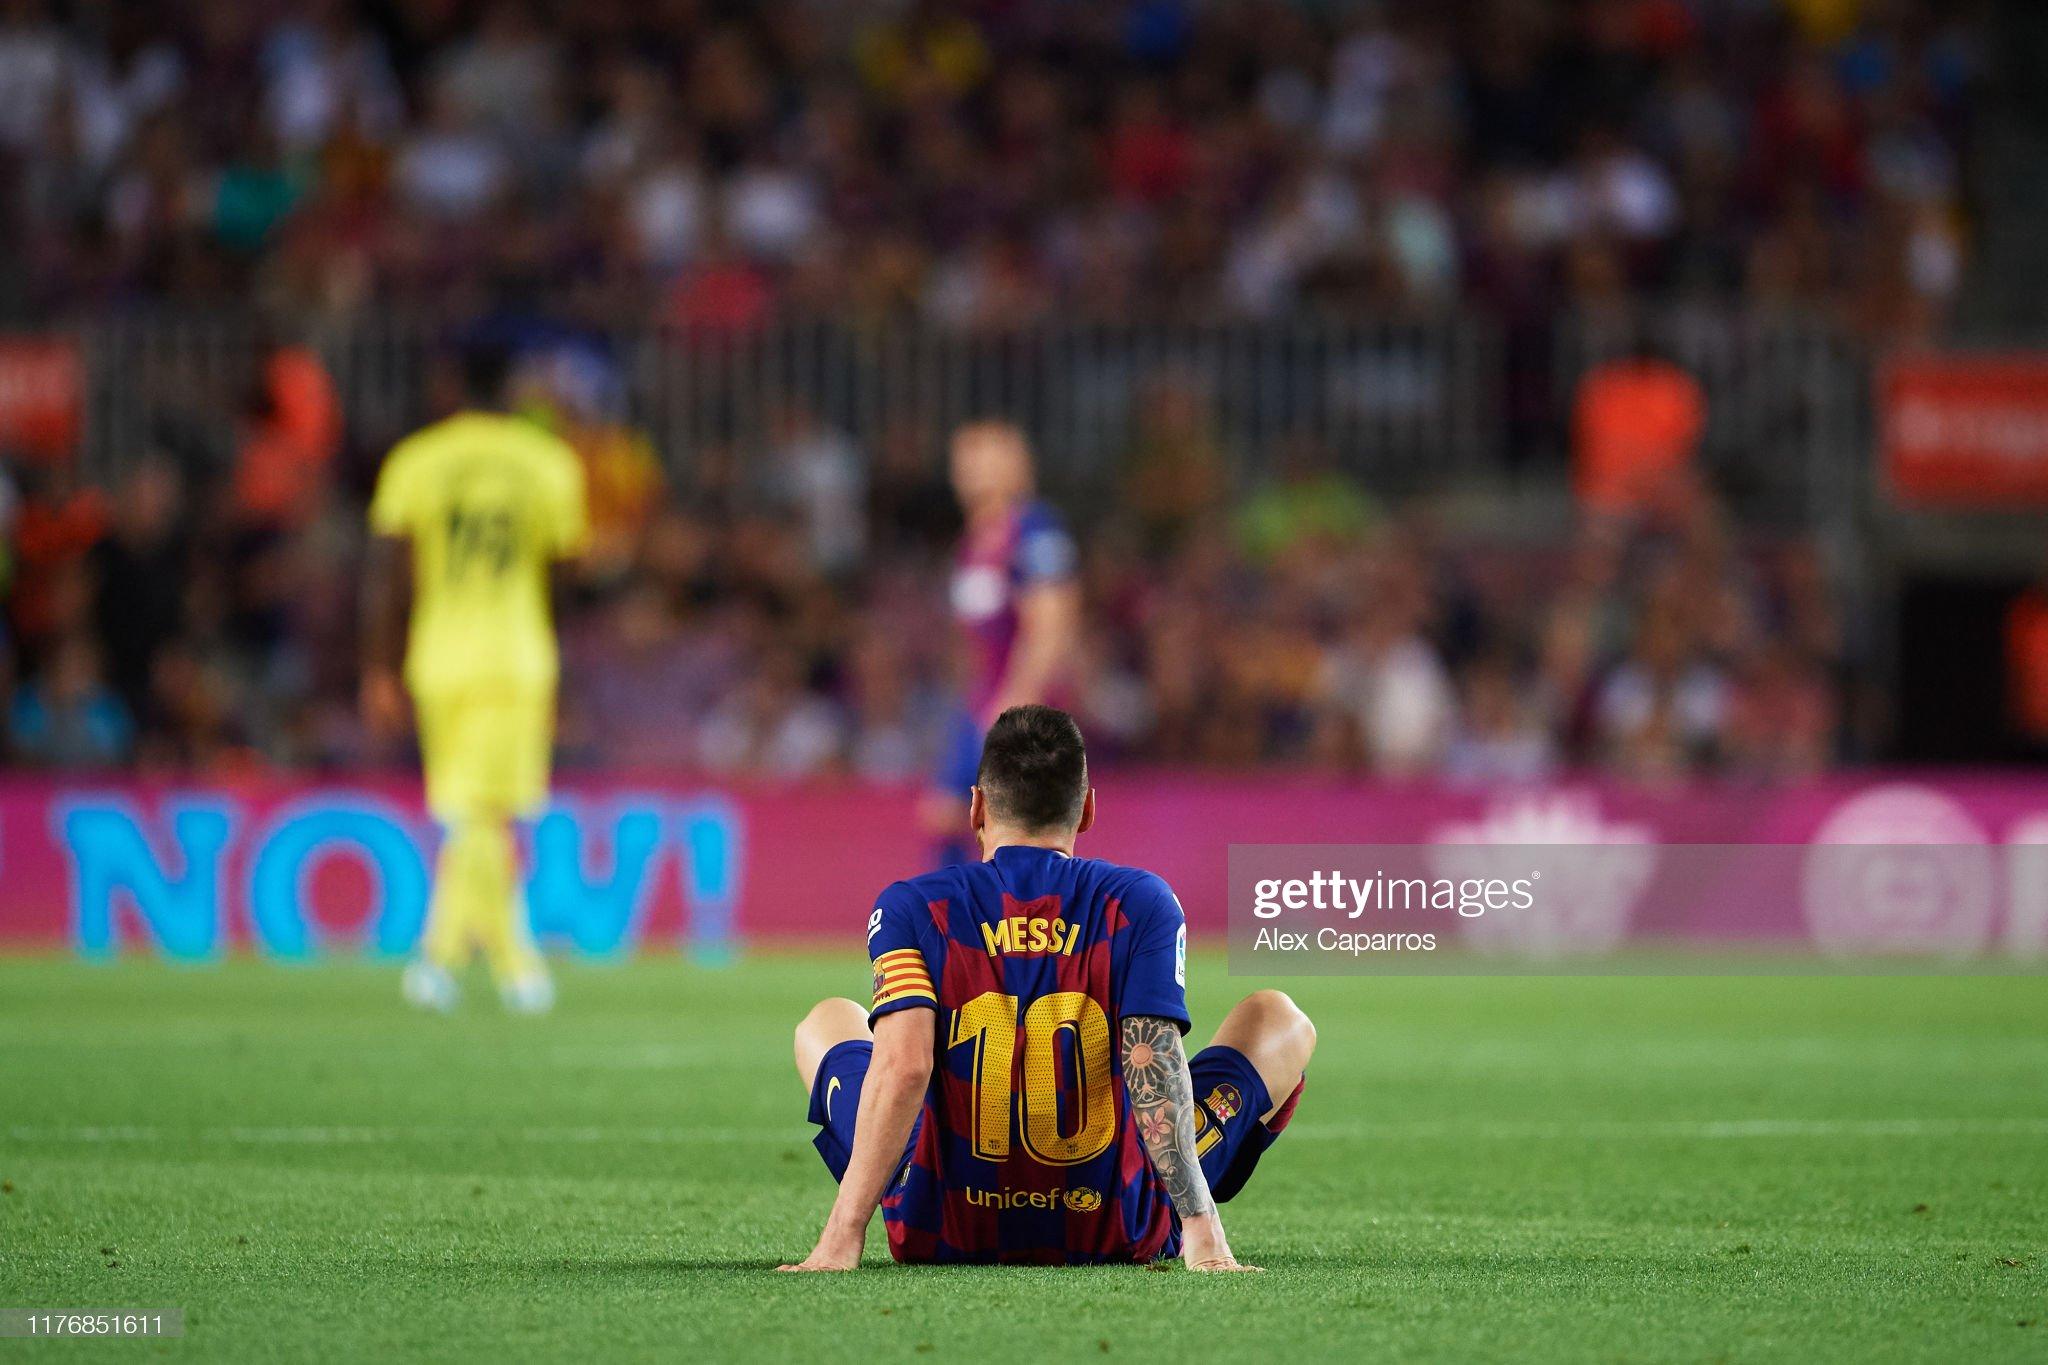 صور مباراة : برشلونة - فياريال 2-1 ( 24-09-2019 )  Lionel-messi-of-fc-barcelona-lays-on-the-pitch-during-the-liga-match-picture-id1176851611?s=2048x2048